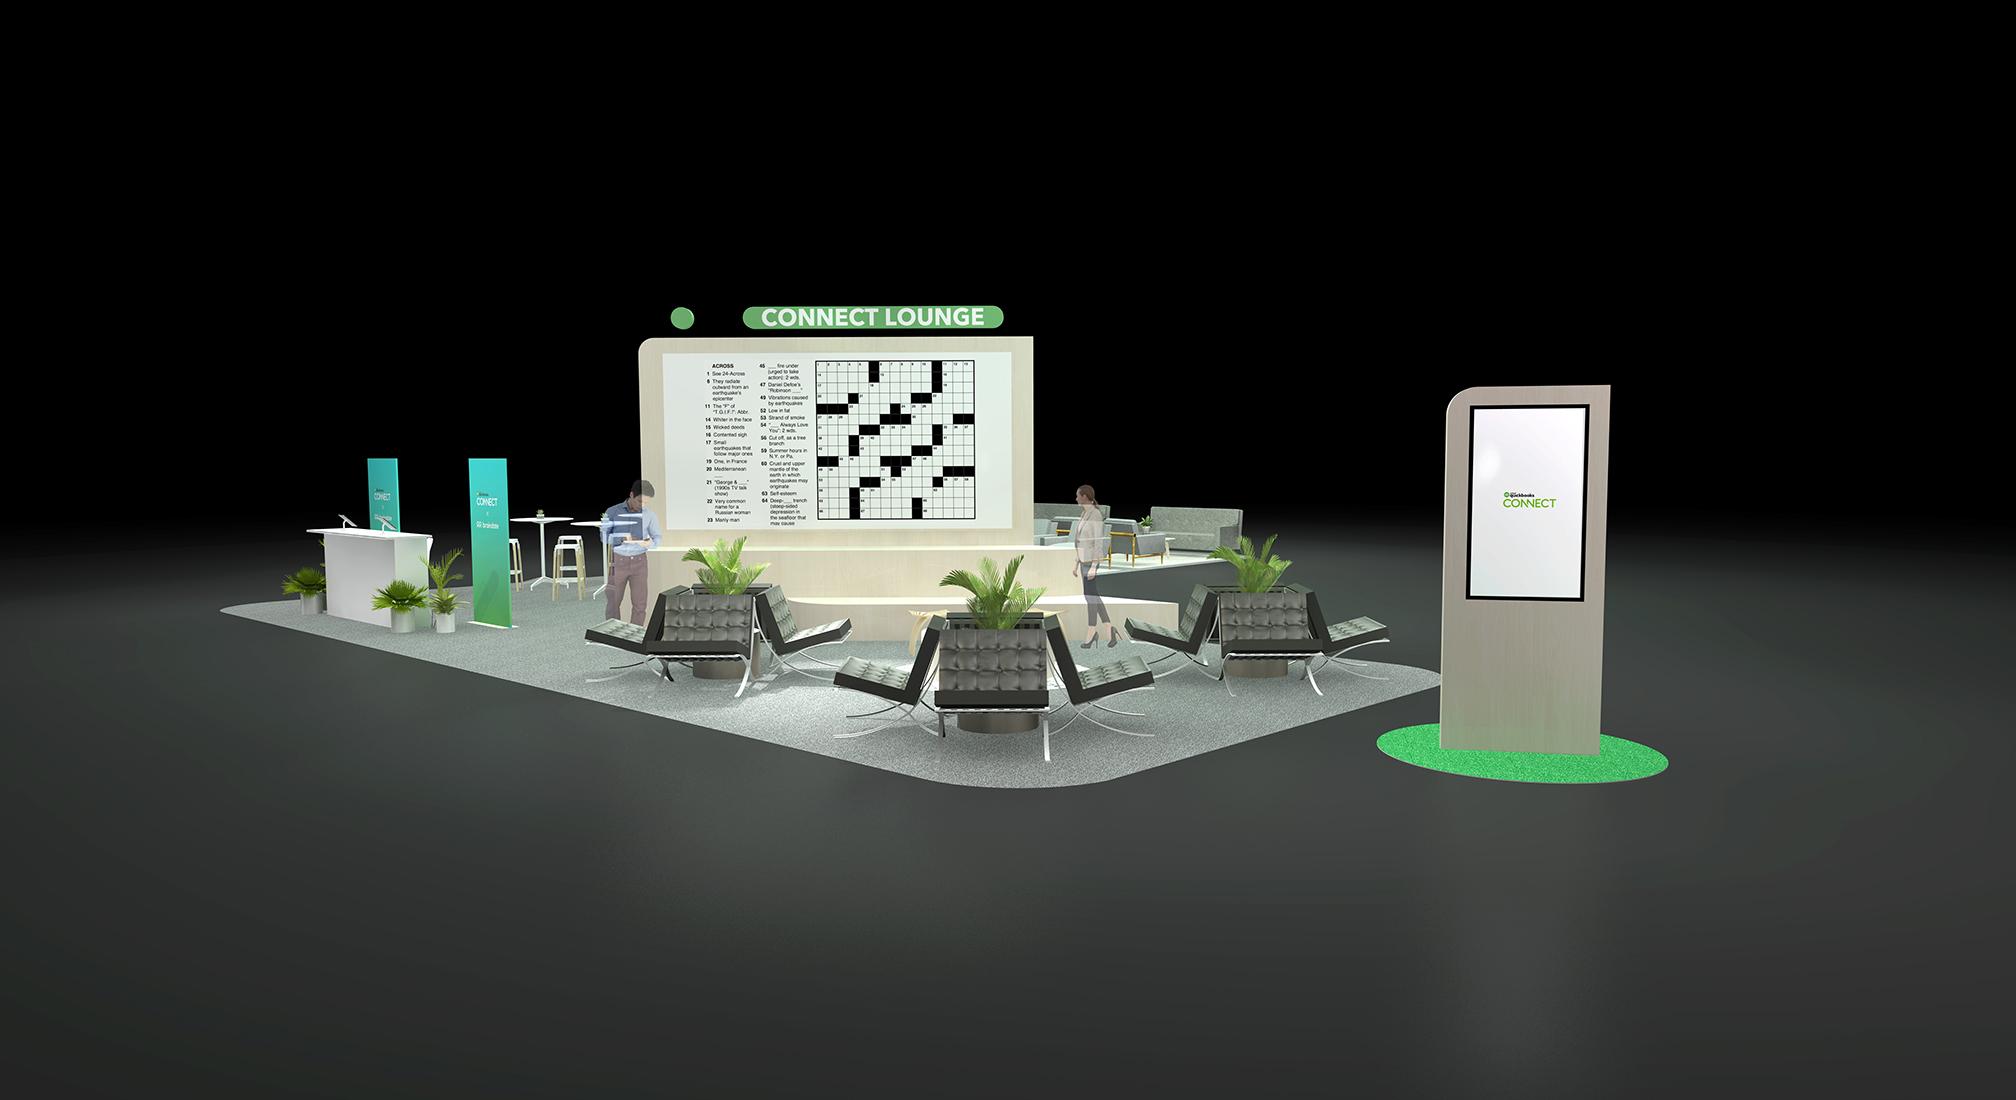 INTUIT_QBC-Lounge~ 2019-01-08 23322100000-2.jpg